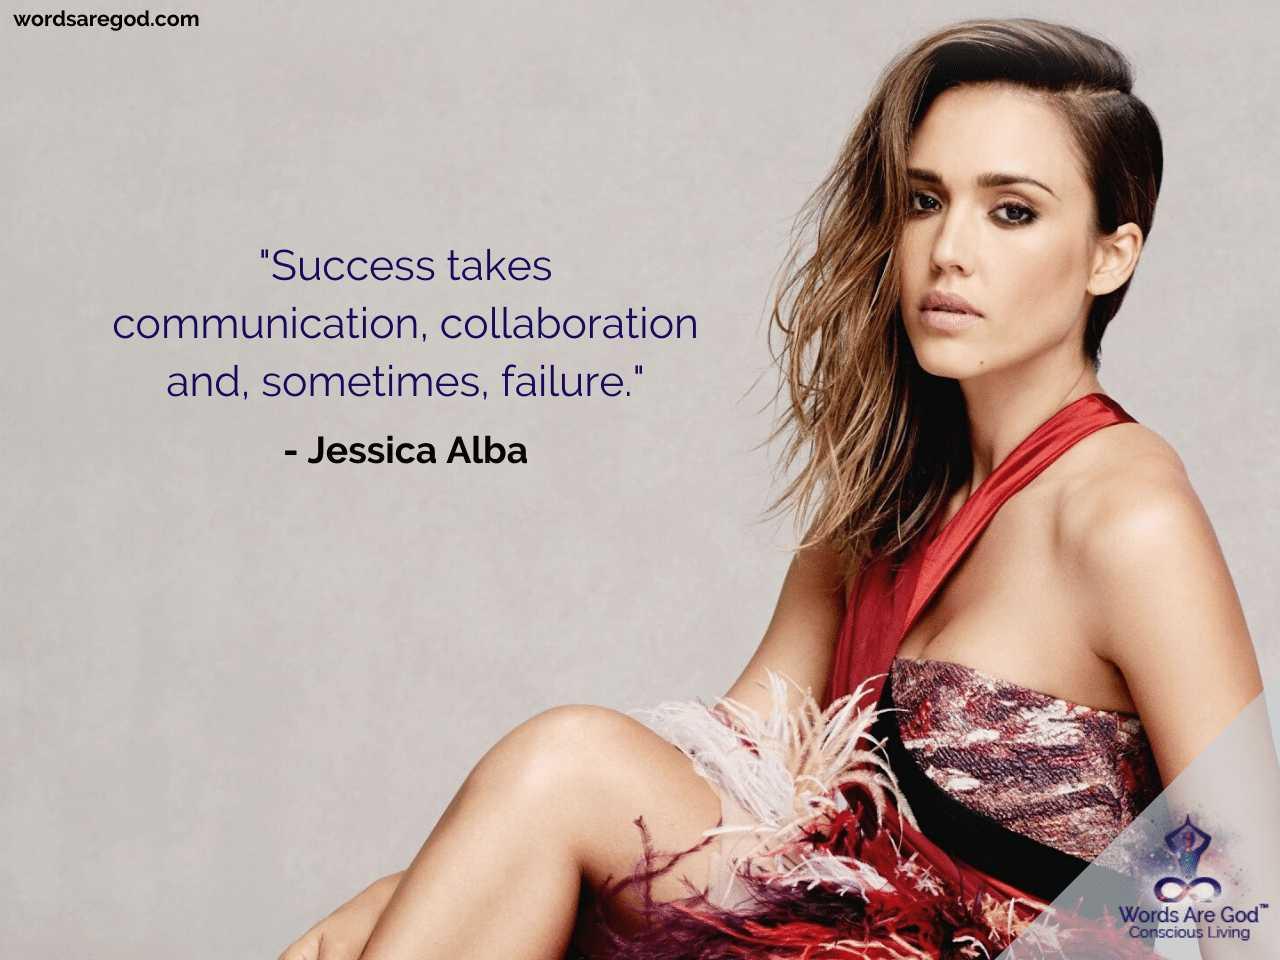 Jessica Alba Best Quotes by Jessica Alba